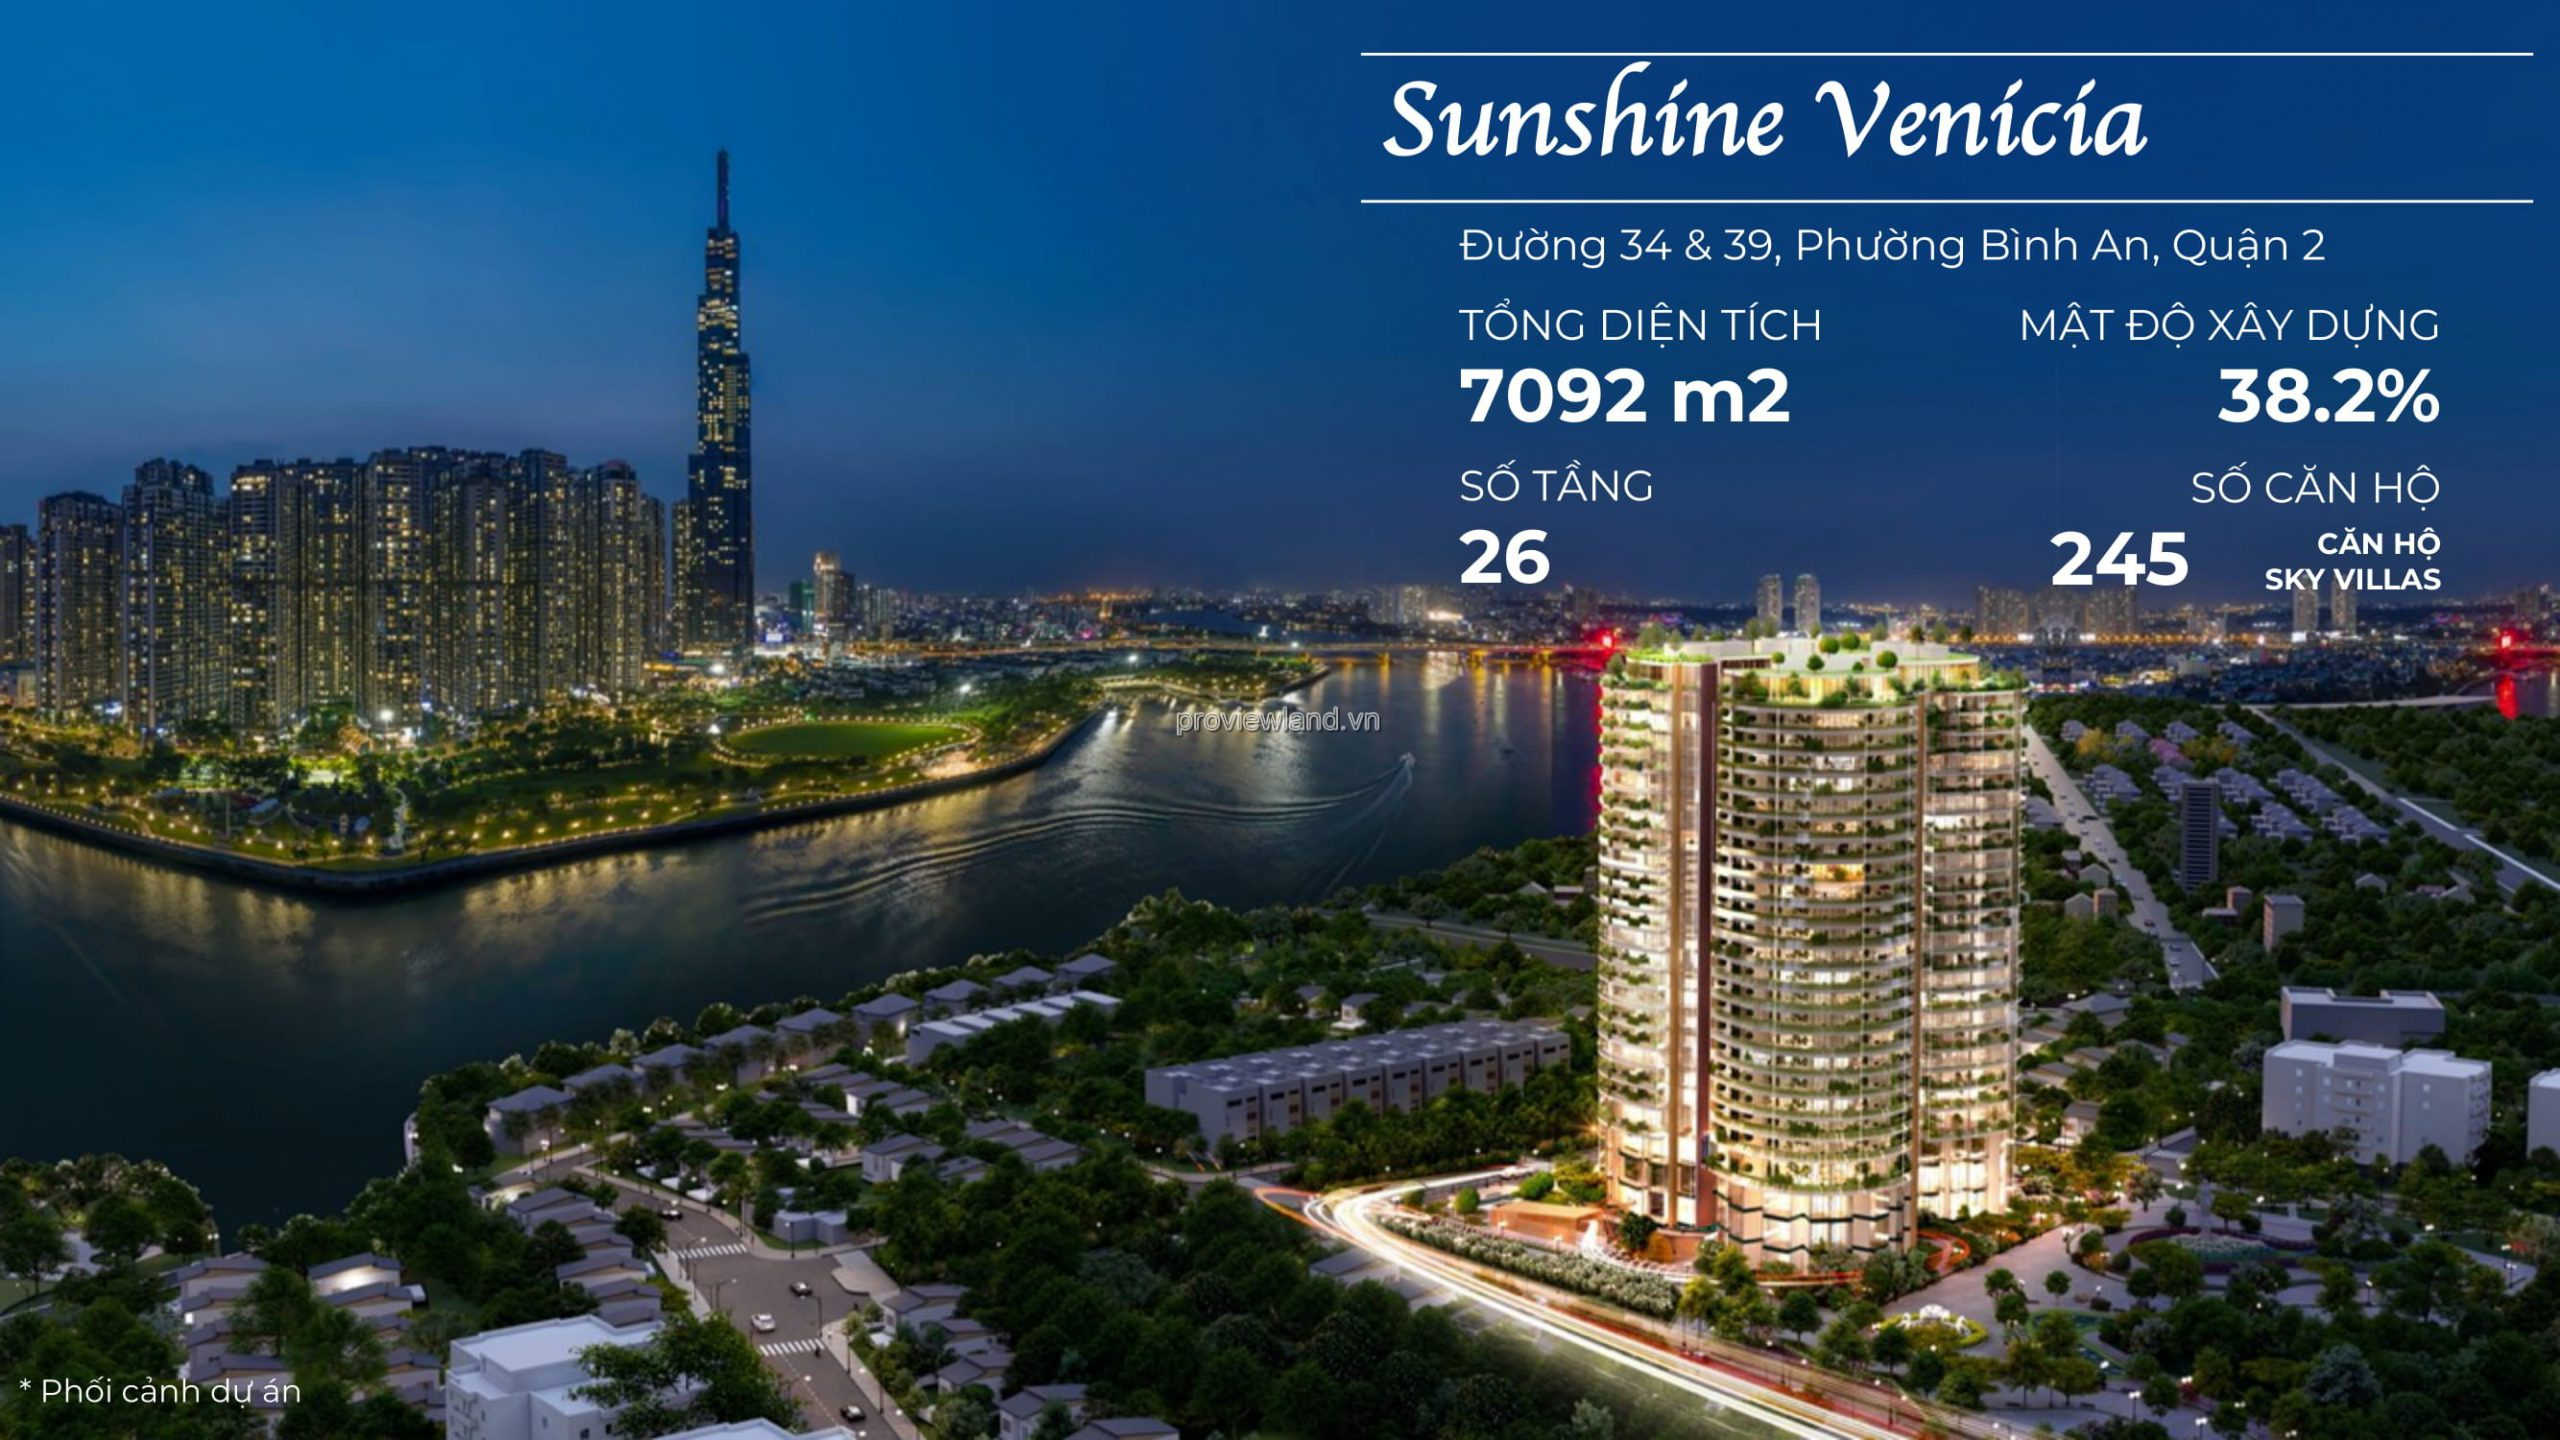 ban-can-ho-sunshine-venicia-thu-thiem-3639